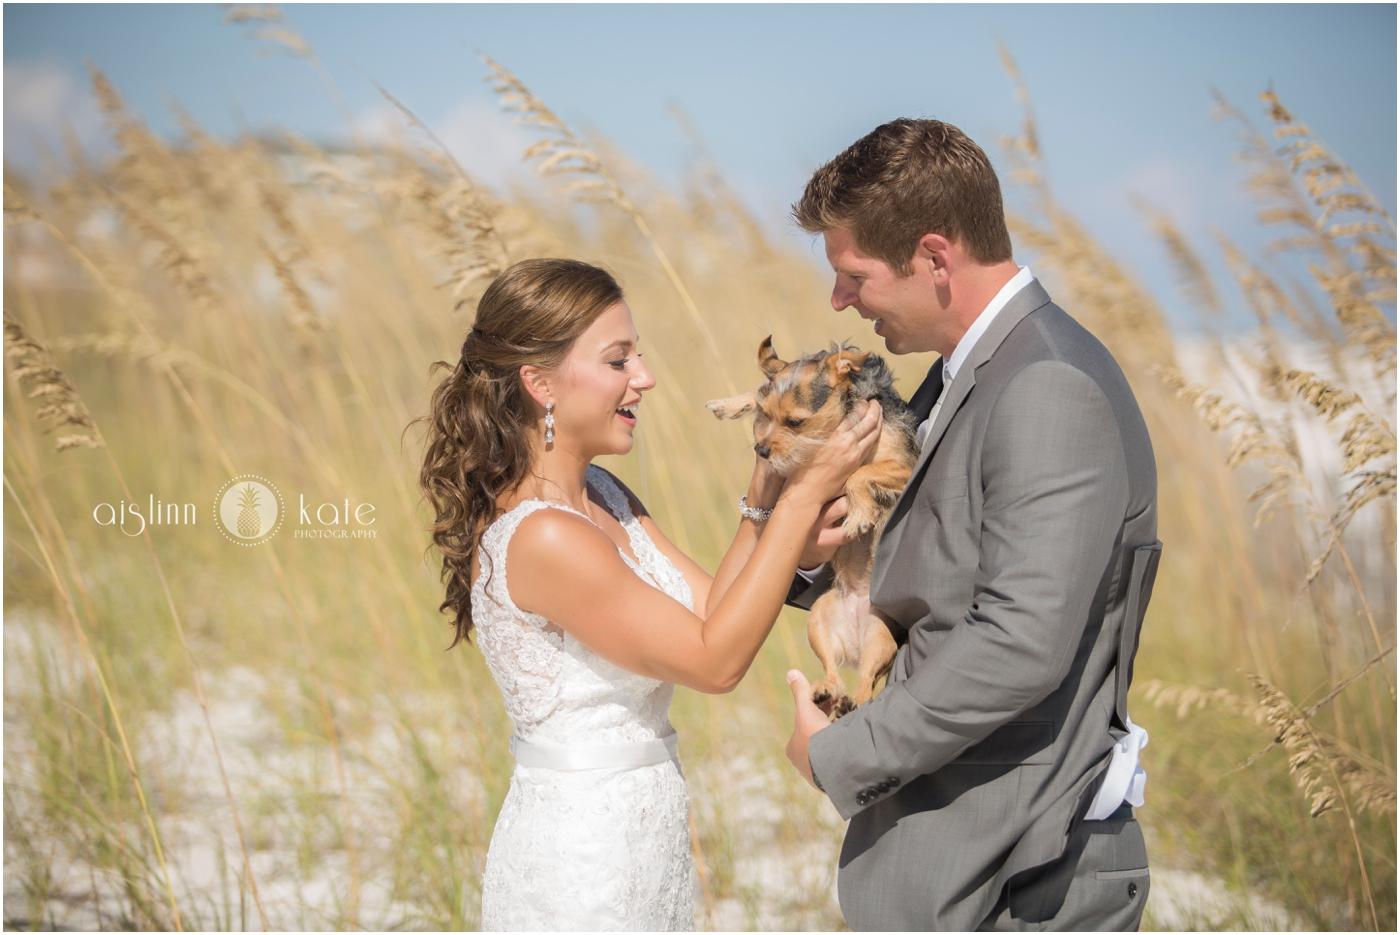 Pensacola-Destin-Wedding-Photographer-7585.jpg